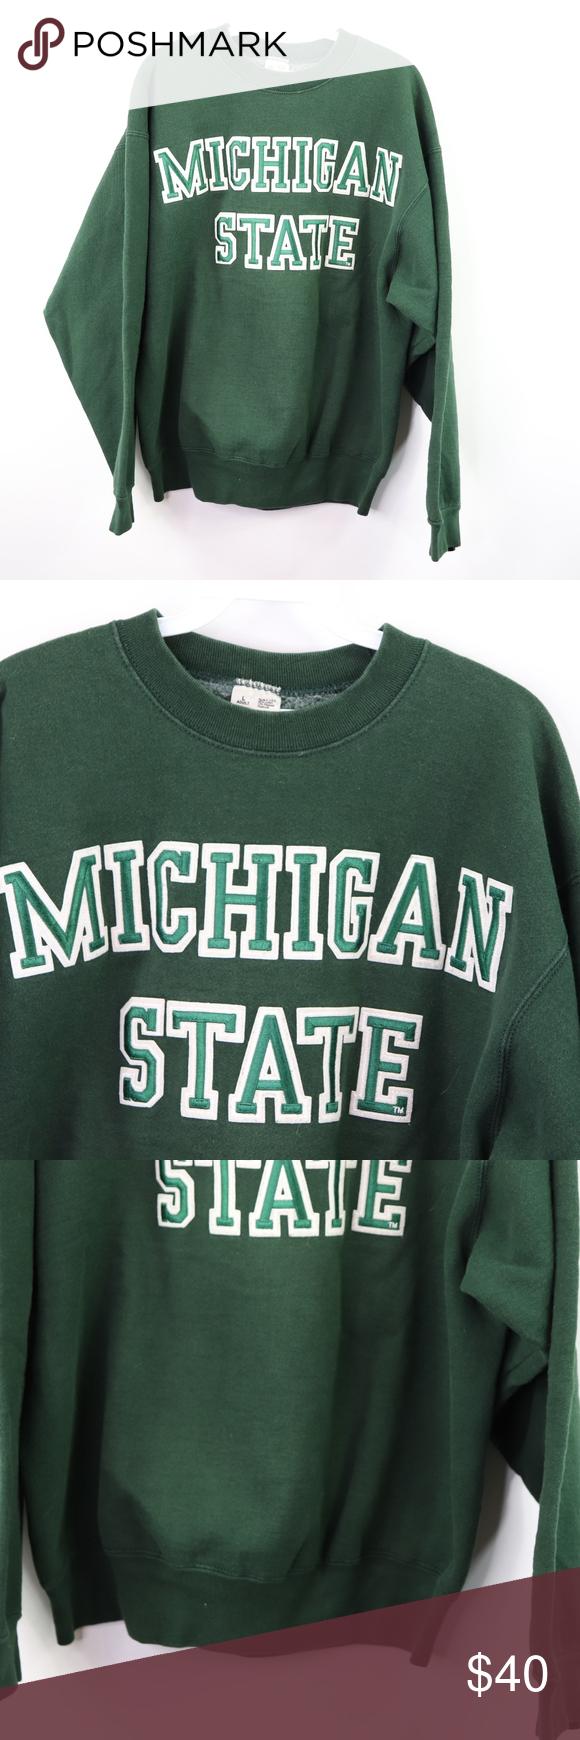 90s Mens Large Michigan State Crewneck Sweater Crew Neck Sweater Crew Neck Sweatshirt Crew Neck [ 1740 x 580 Pixel ]